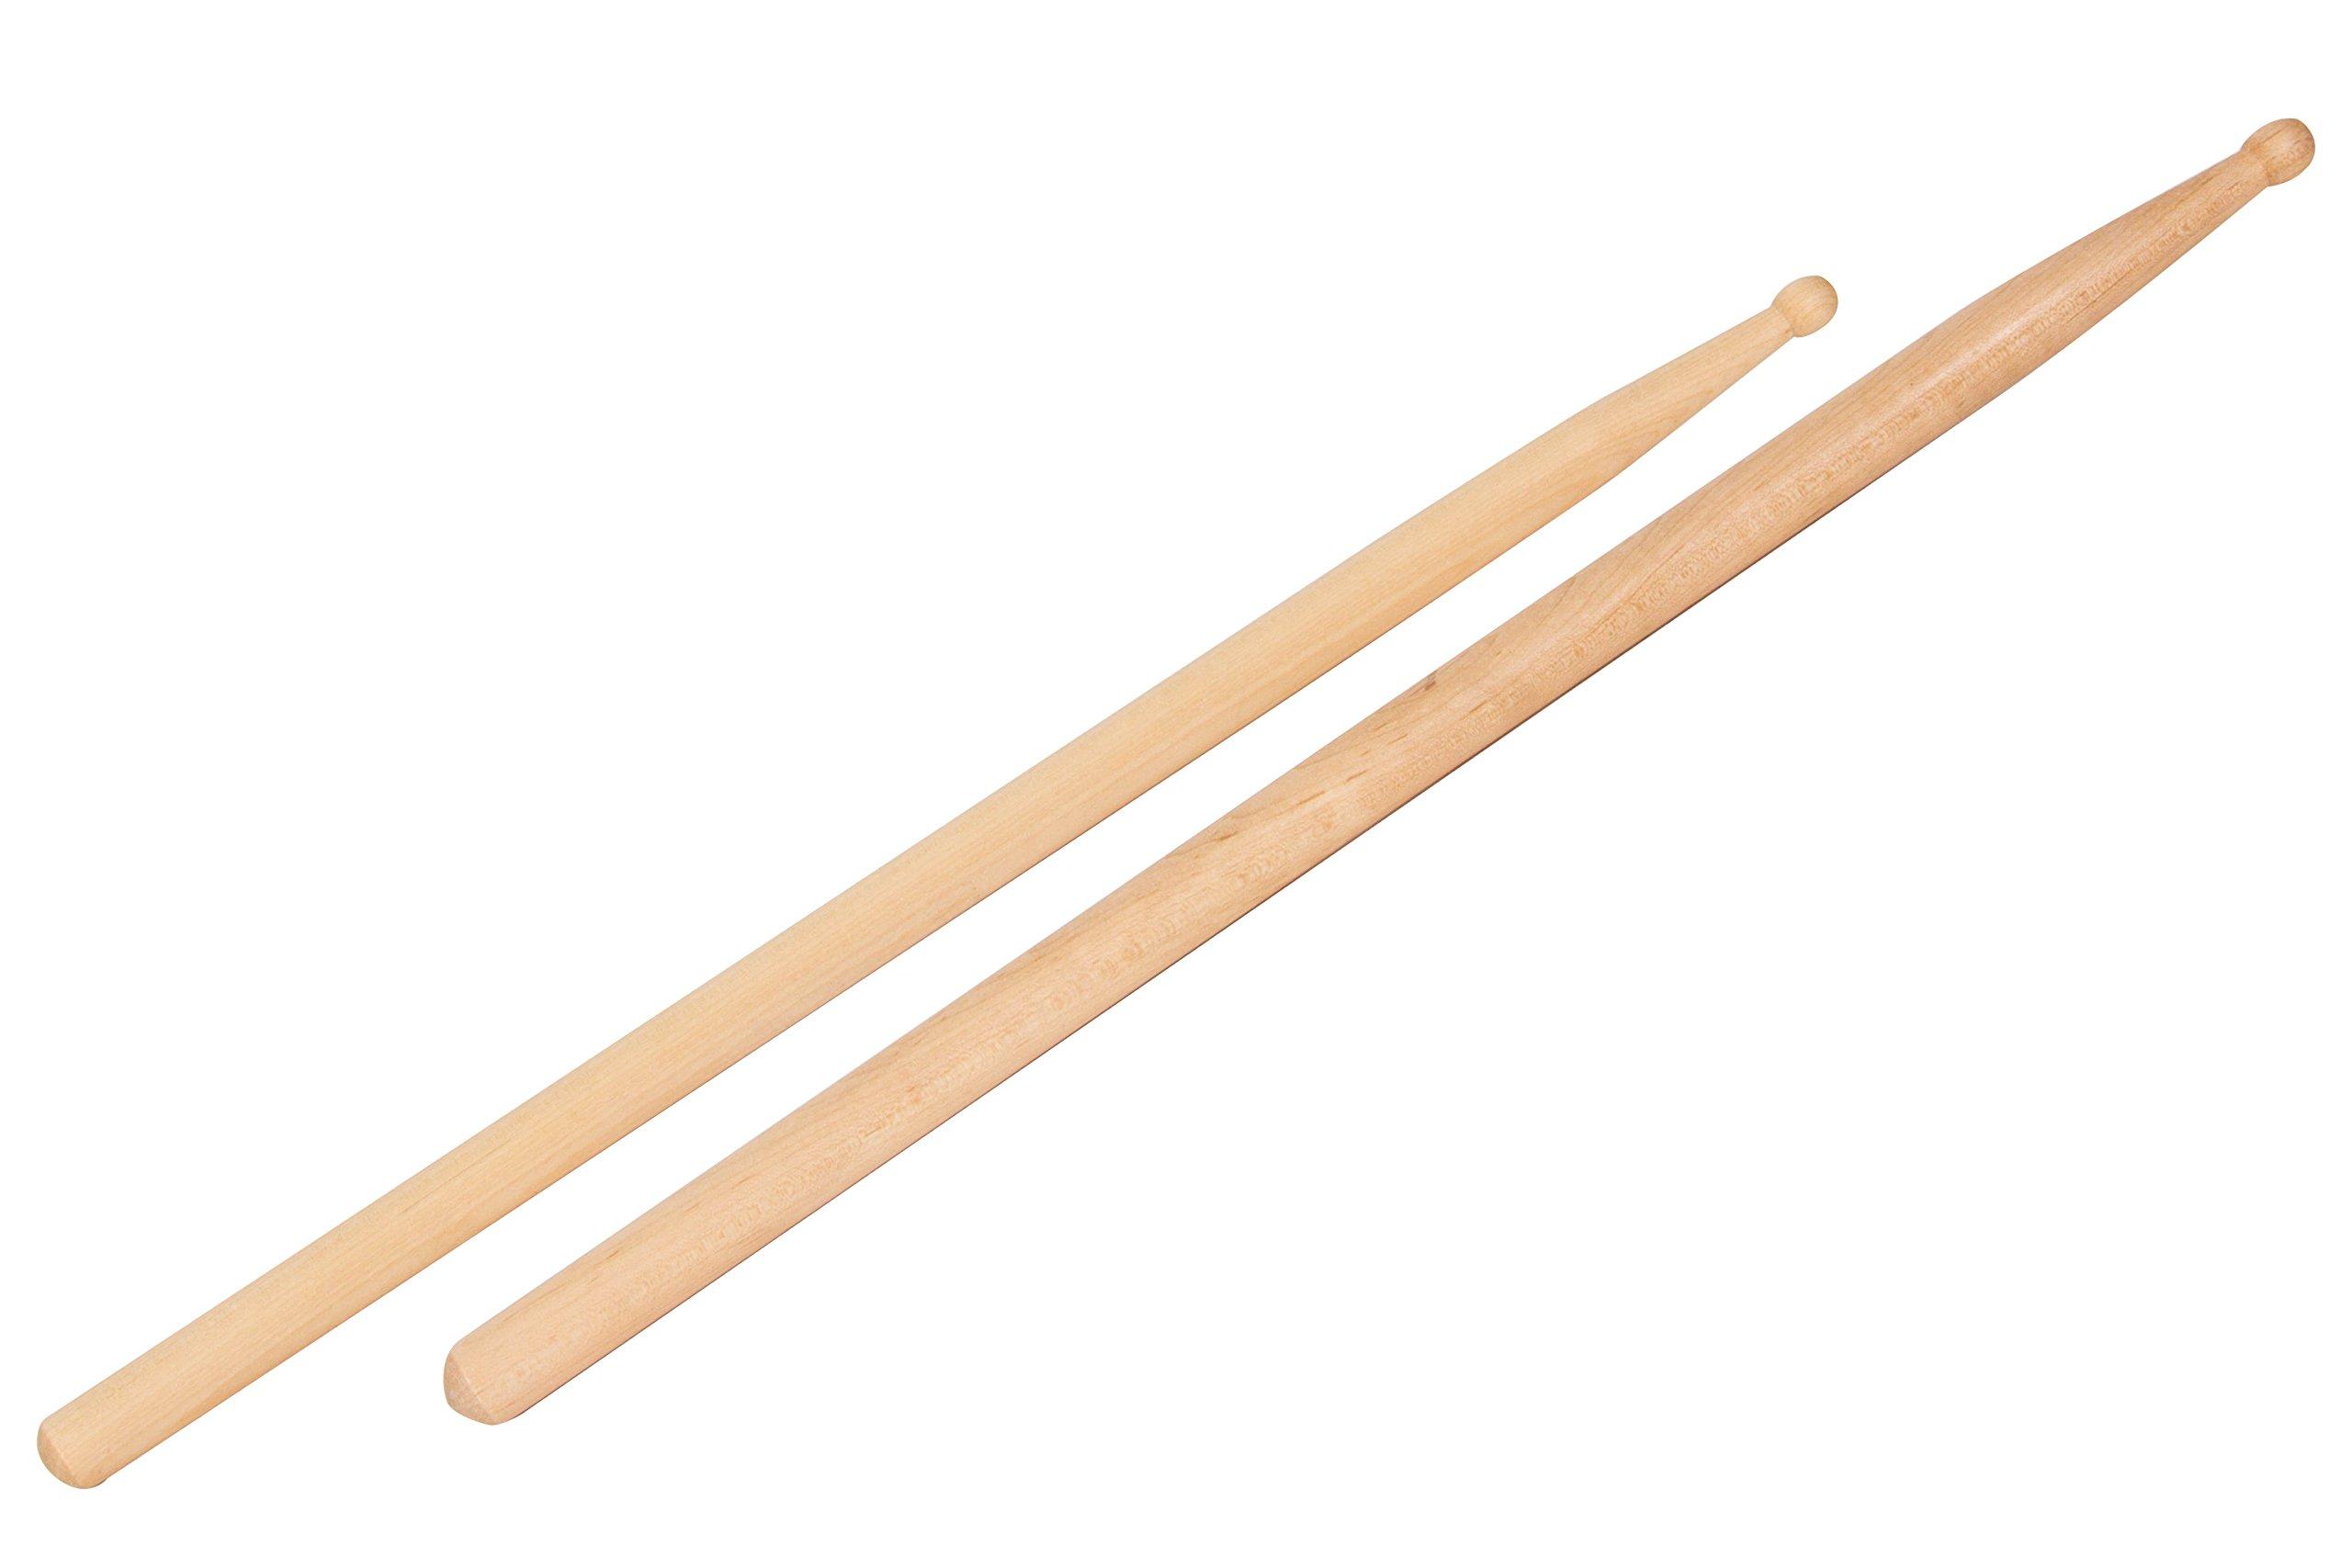 Brick of 12 pairs Maple Wood Drum Sticks 5B (L16in) by Westco